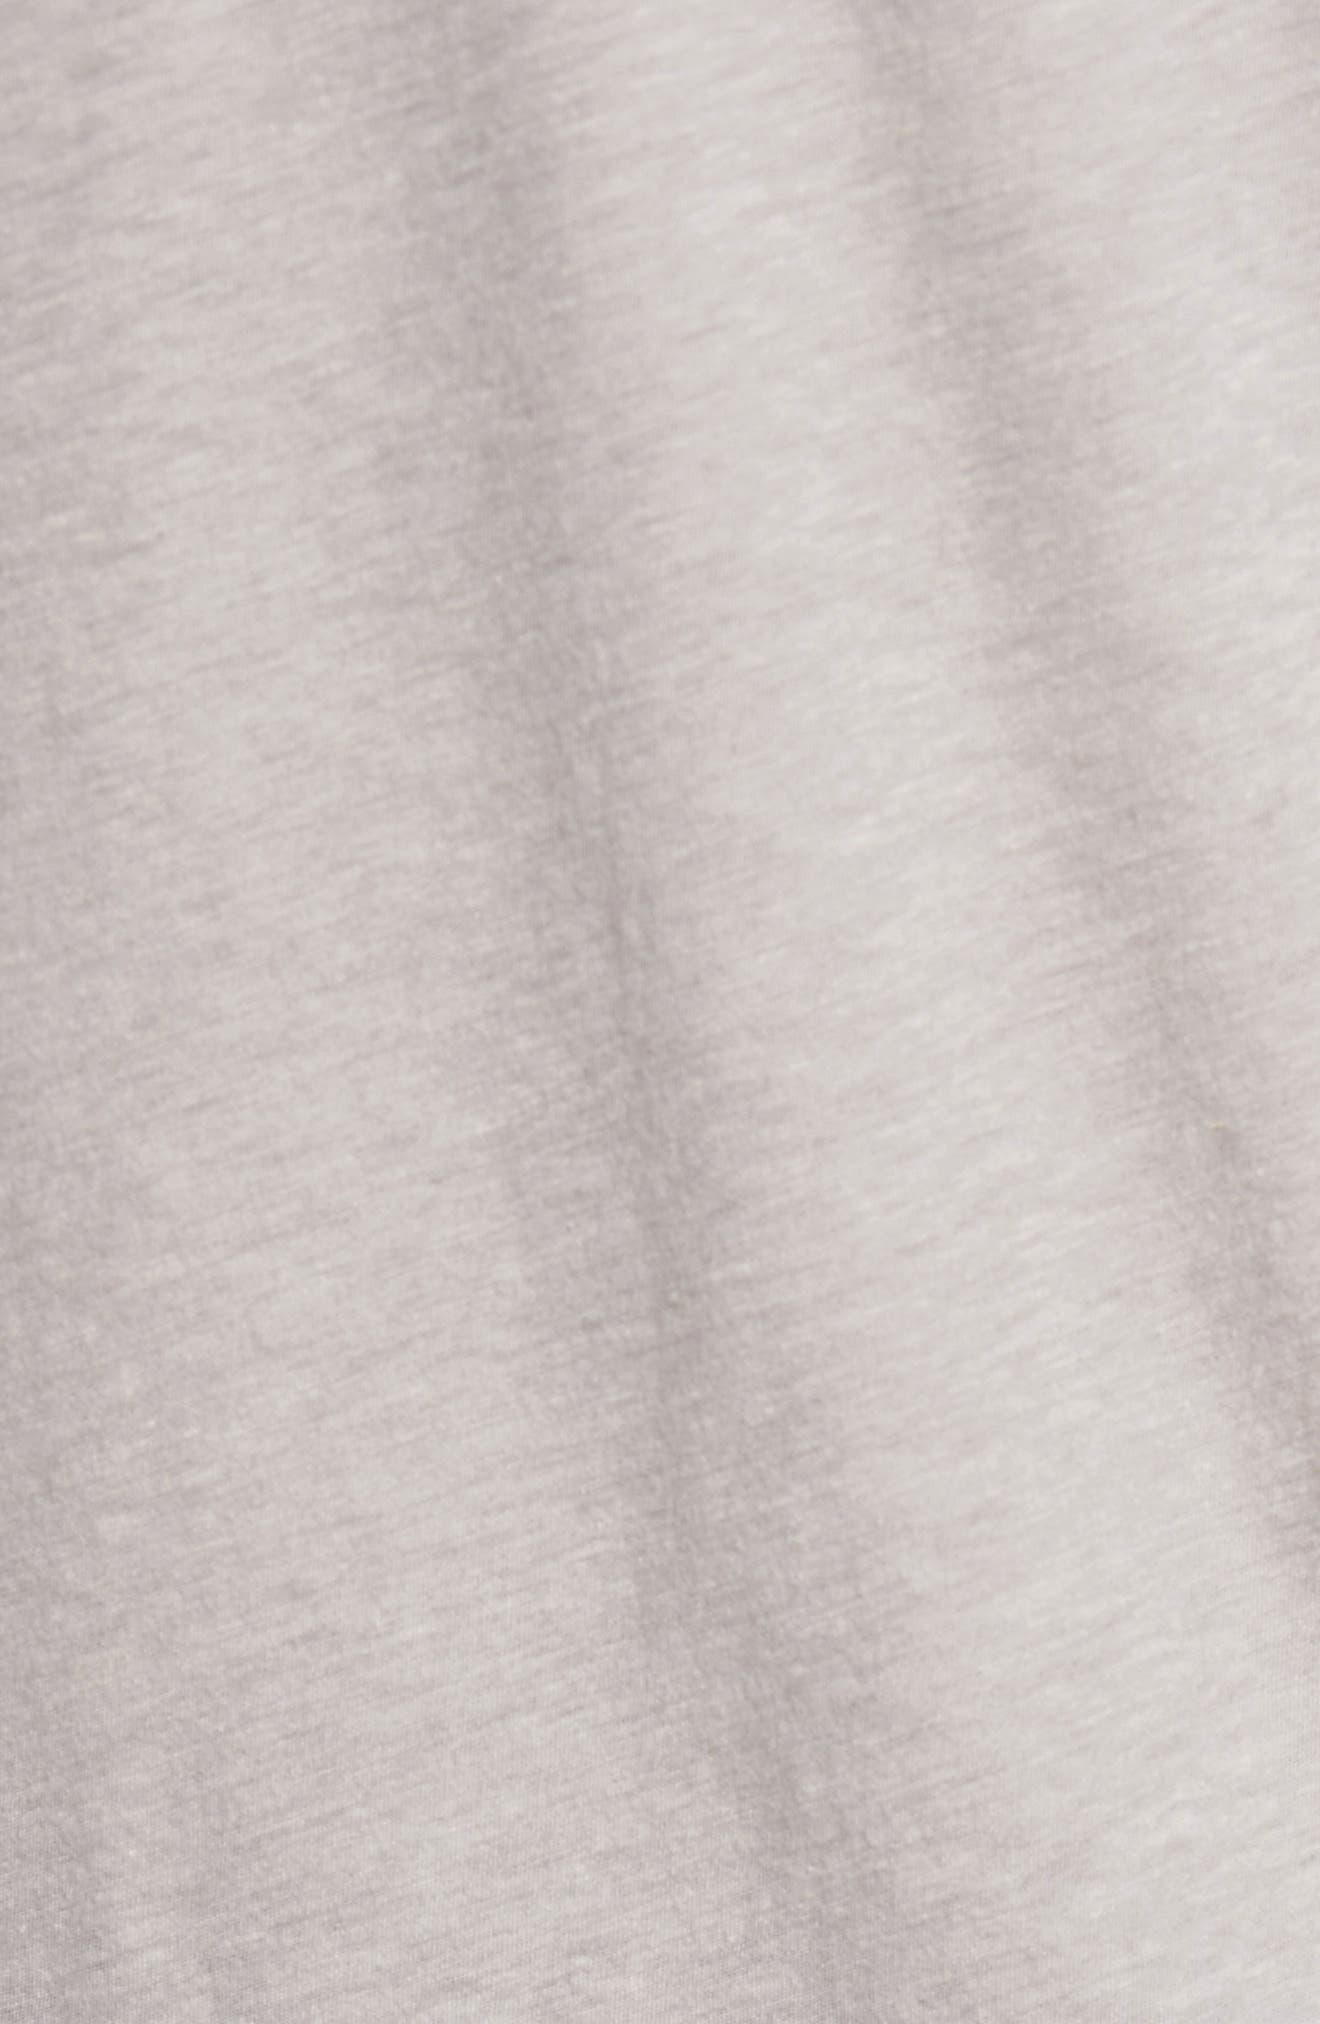 Mélange Long Sleeve Graphic T-Shirt,                             Alternate thumbnail 5, color,                             Fossil Melange